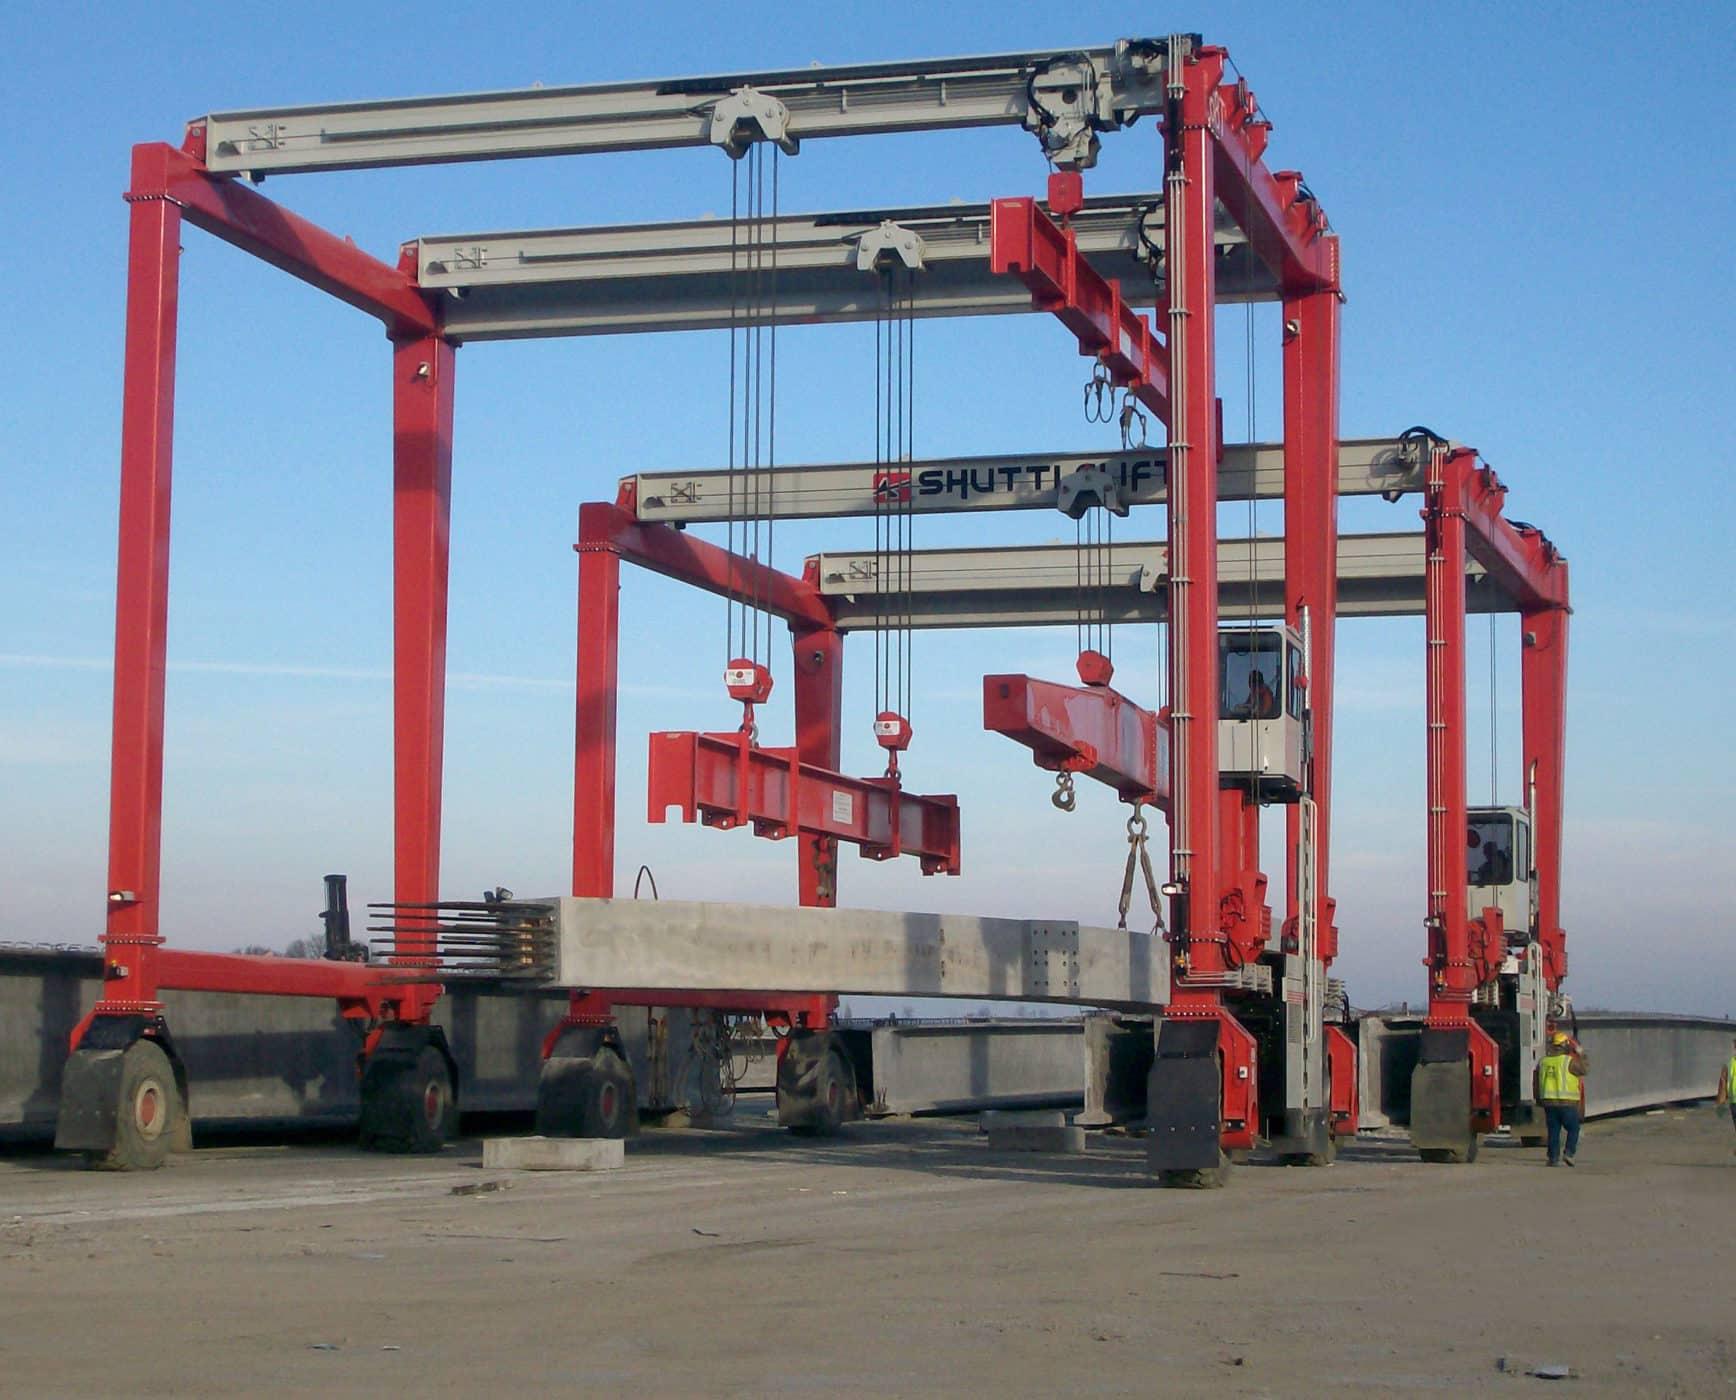 Dual Shuttlelift ISL series rubber tire gantry cranes